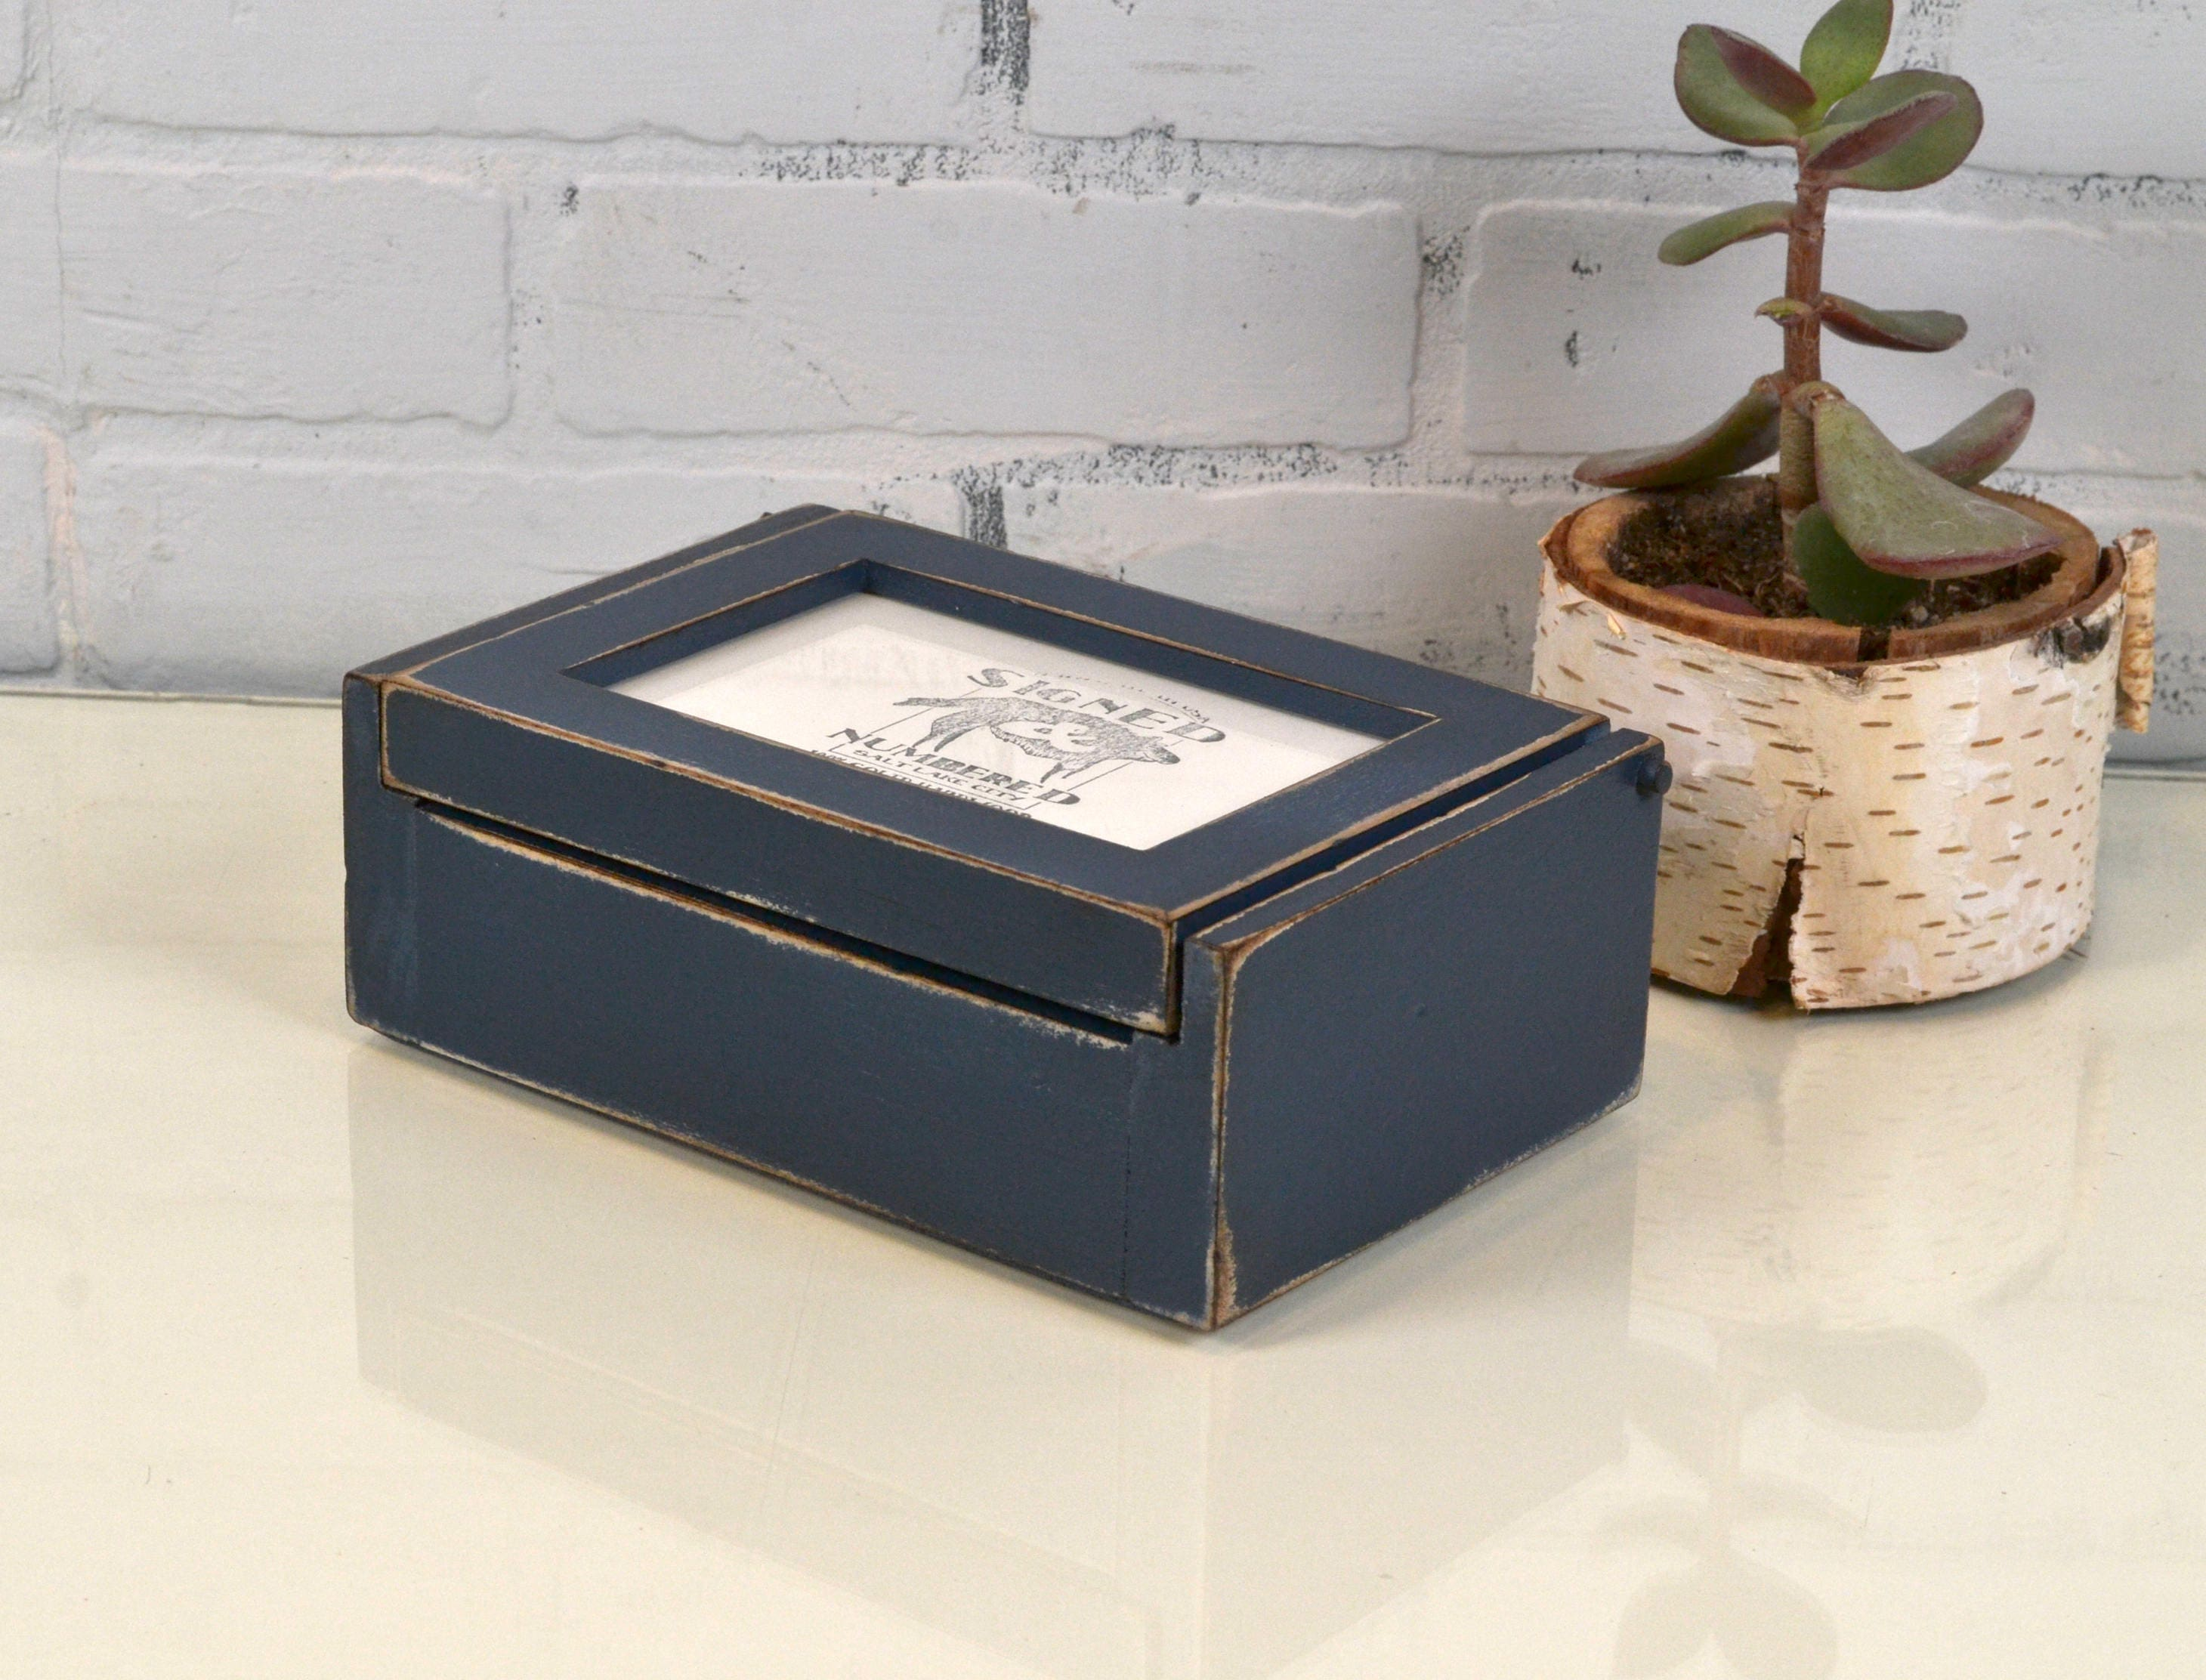 Wooden Keepsake Box 4x6 Picture Frame Lid In Super Vintage Navy